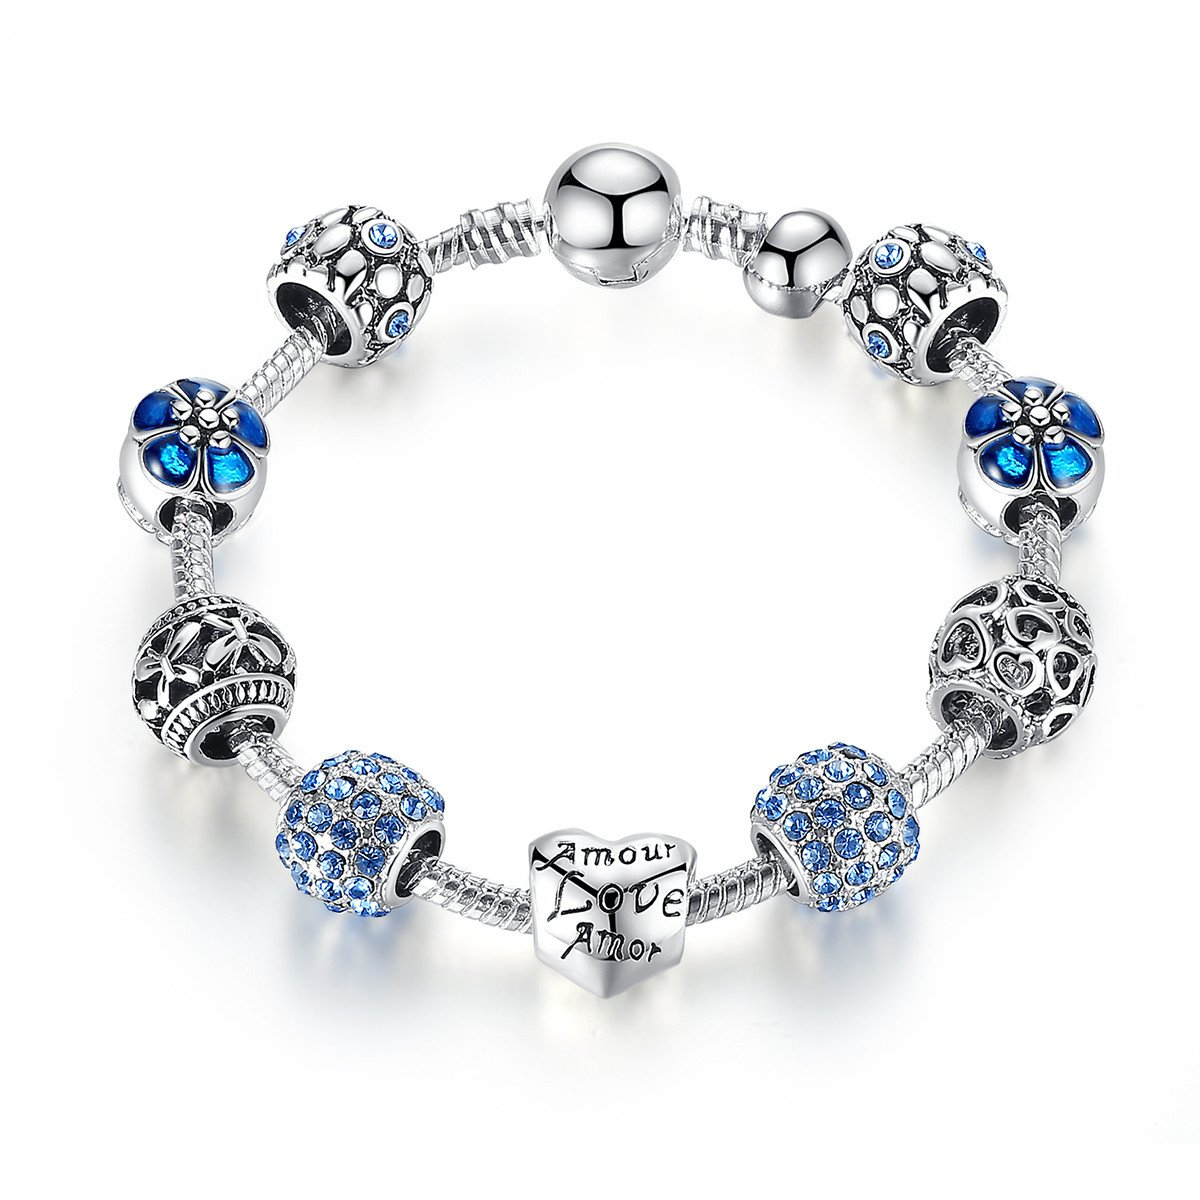 Christmas Day Gift Blue Fashion Charm Bangle Bracelet for Women Girls Silver Plated 20cm